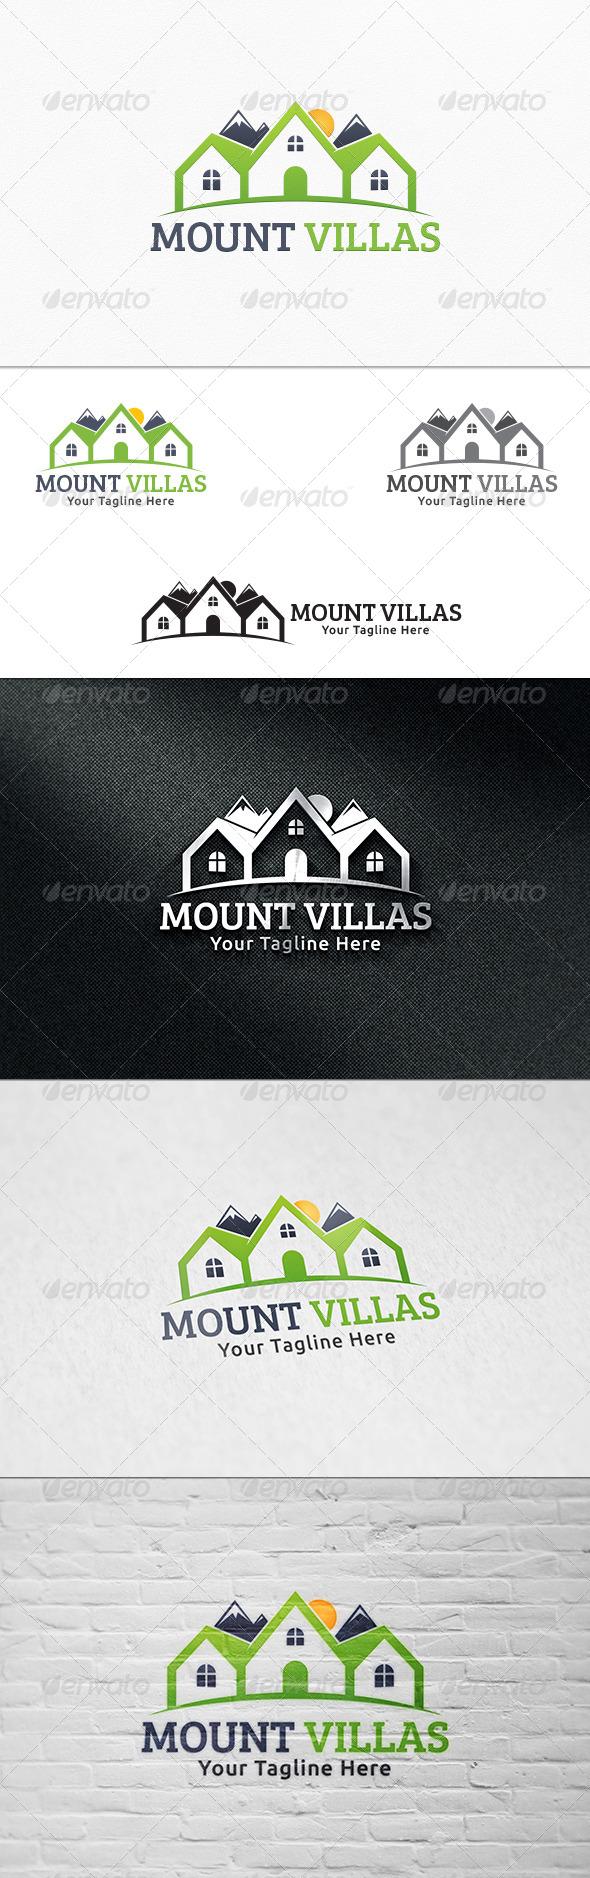 GraphicRiver Mount Villas Logo Template 8056800